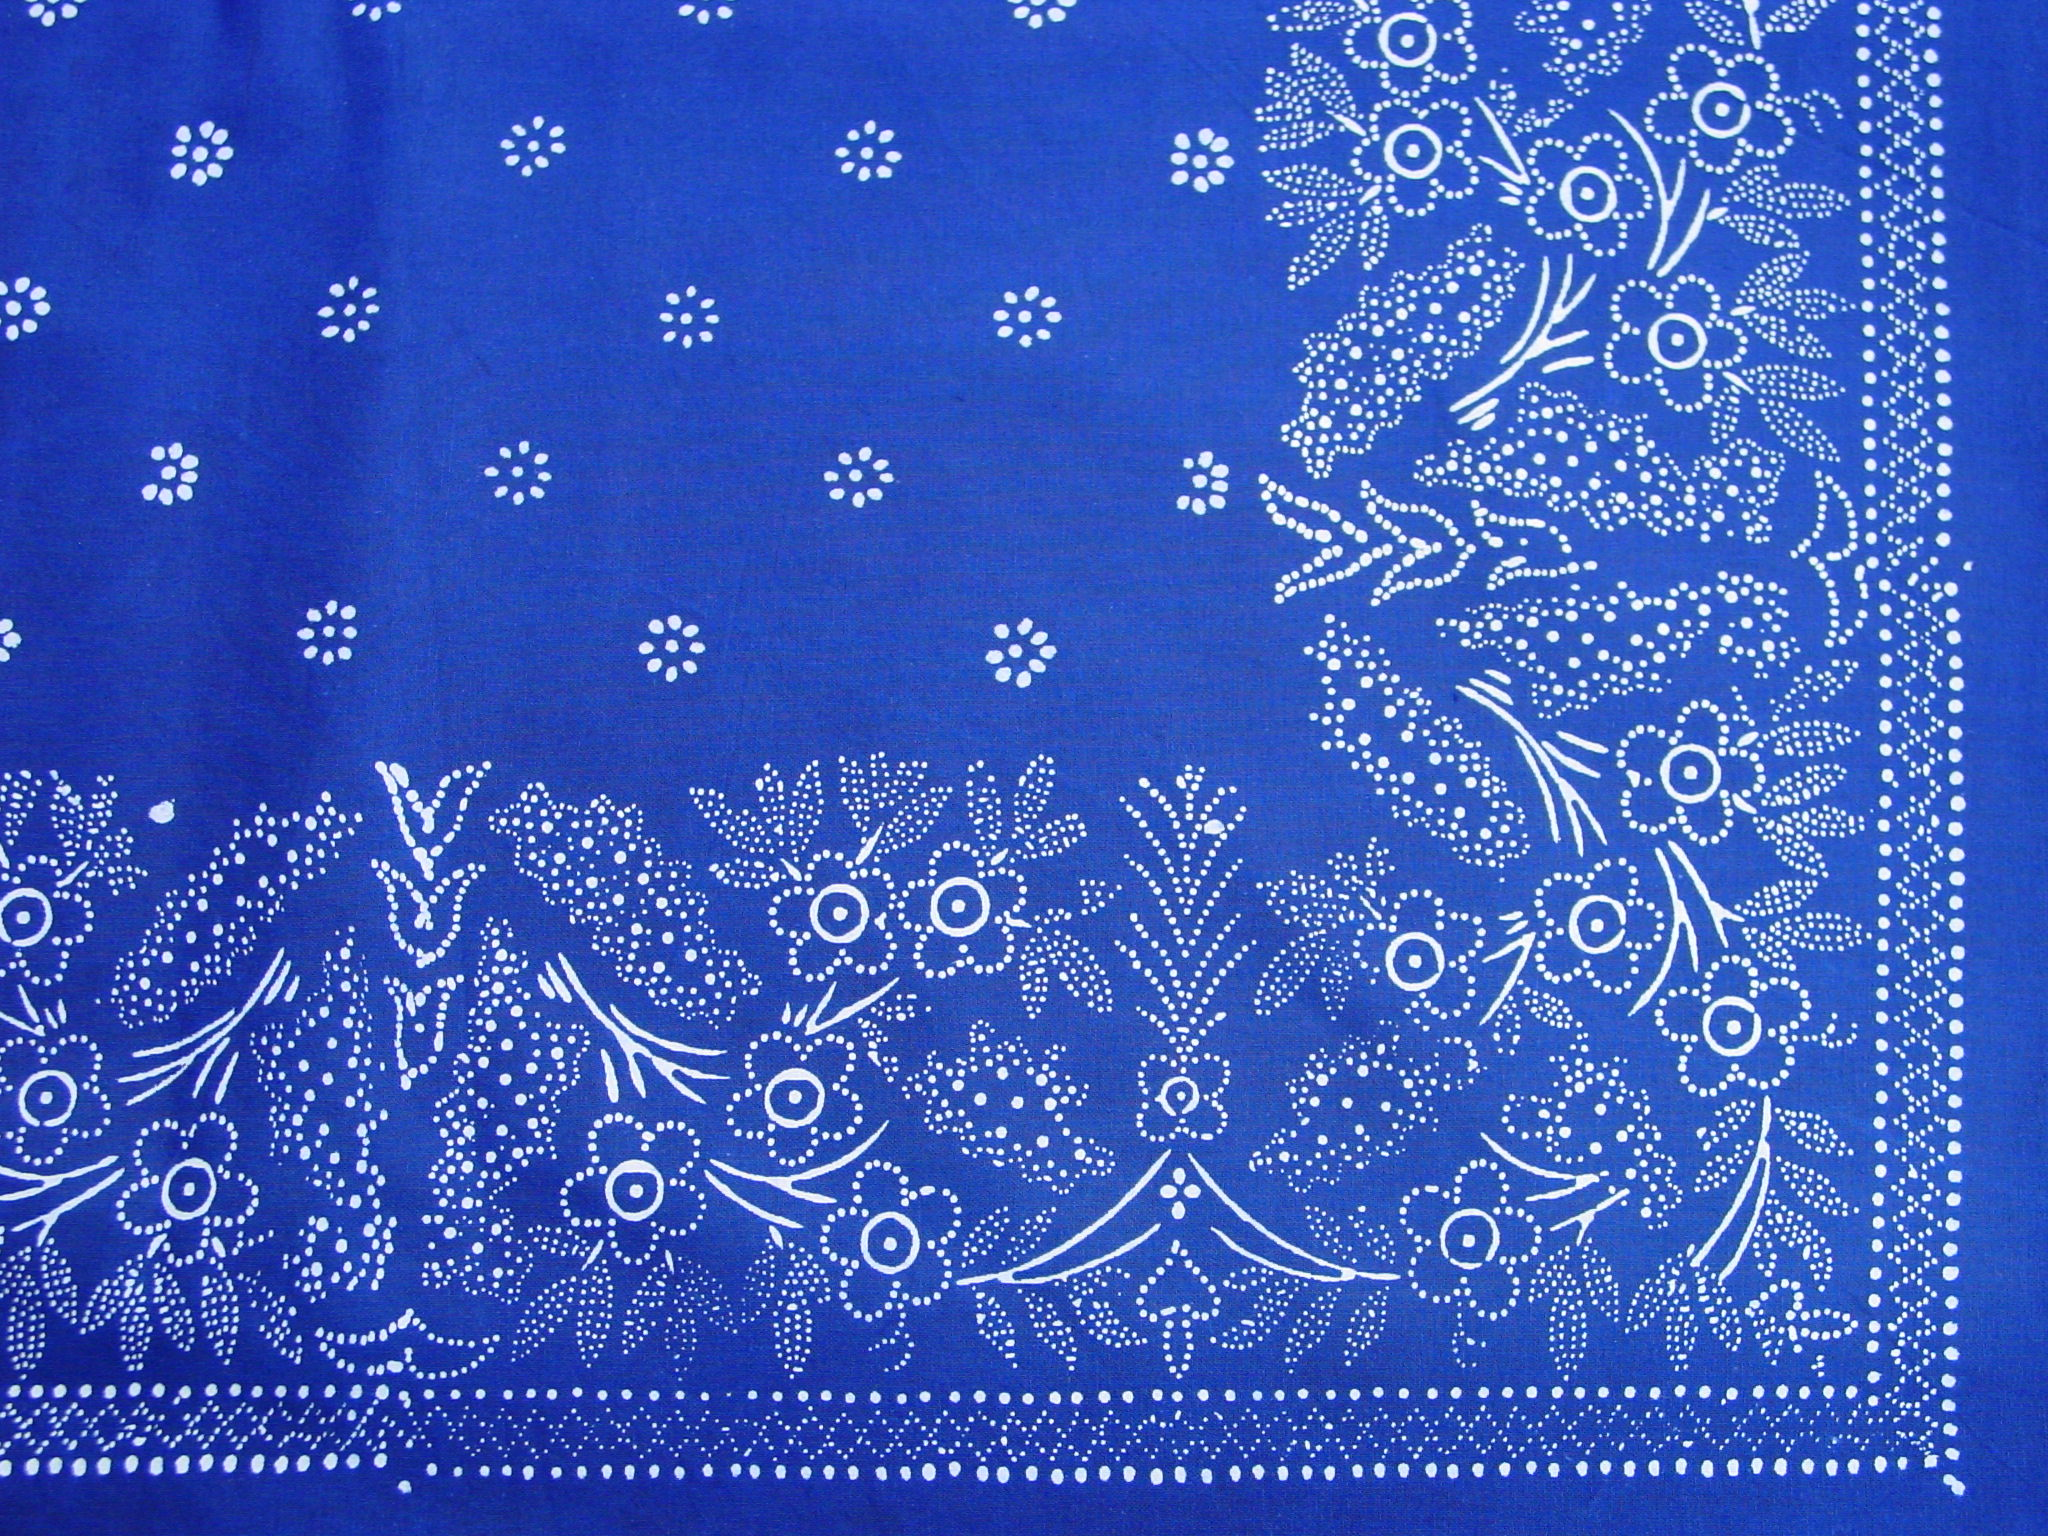 Große Blaudruck-Tischdecke 6487-1312